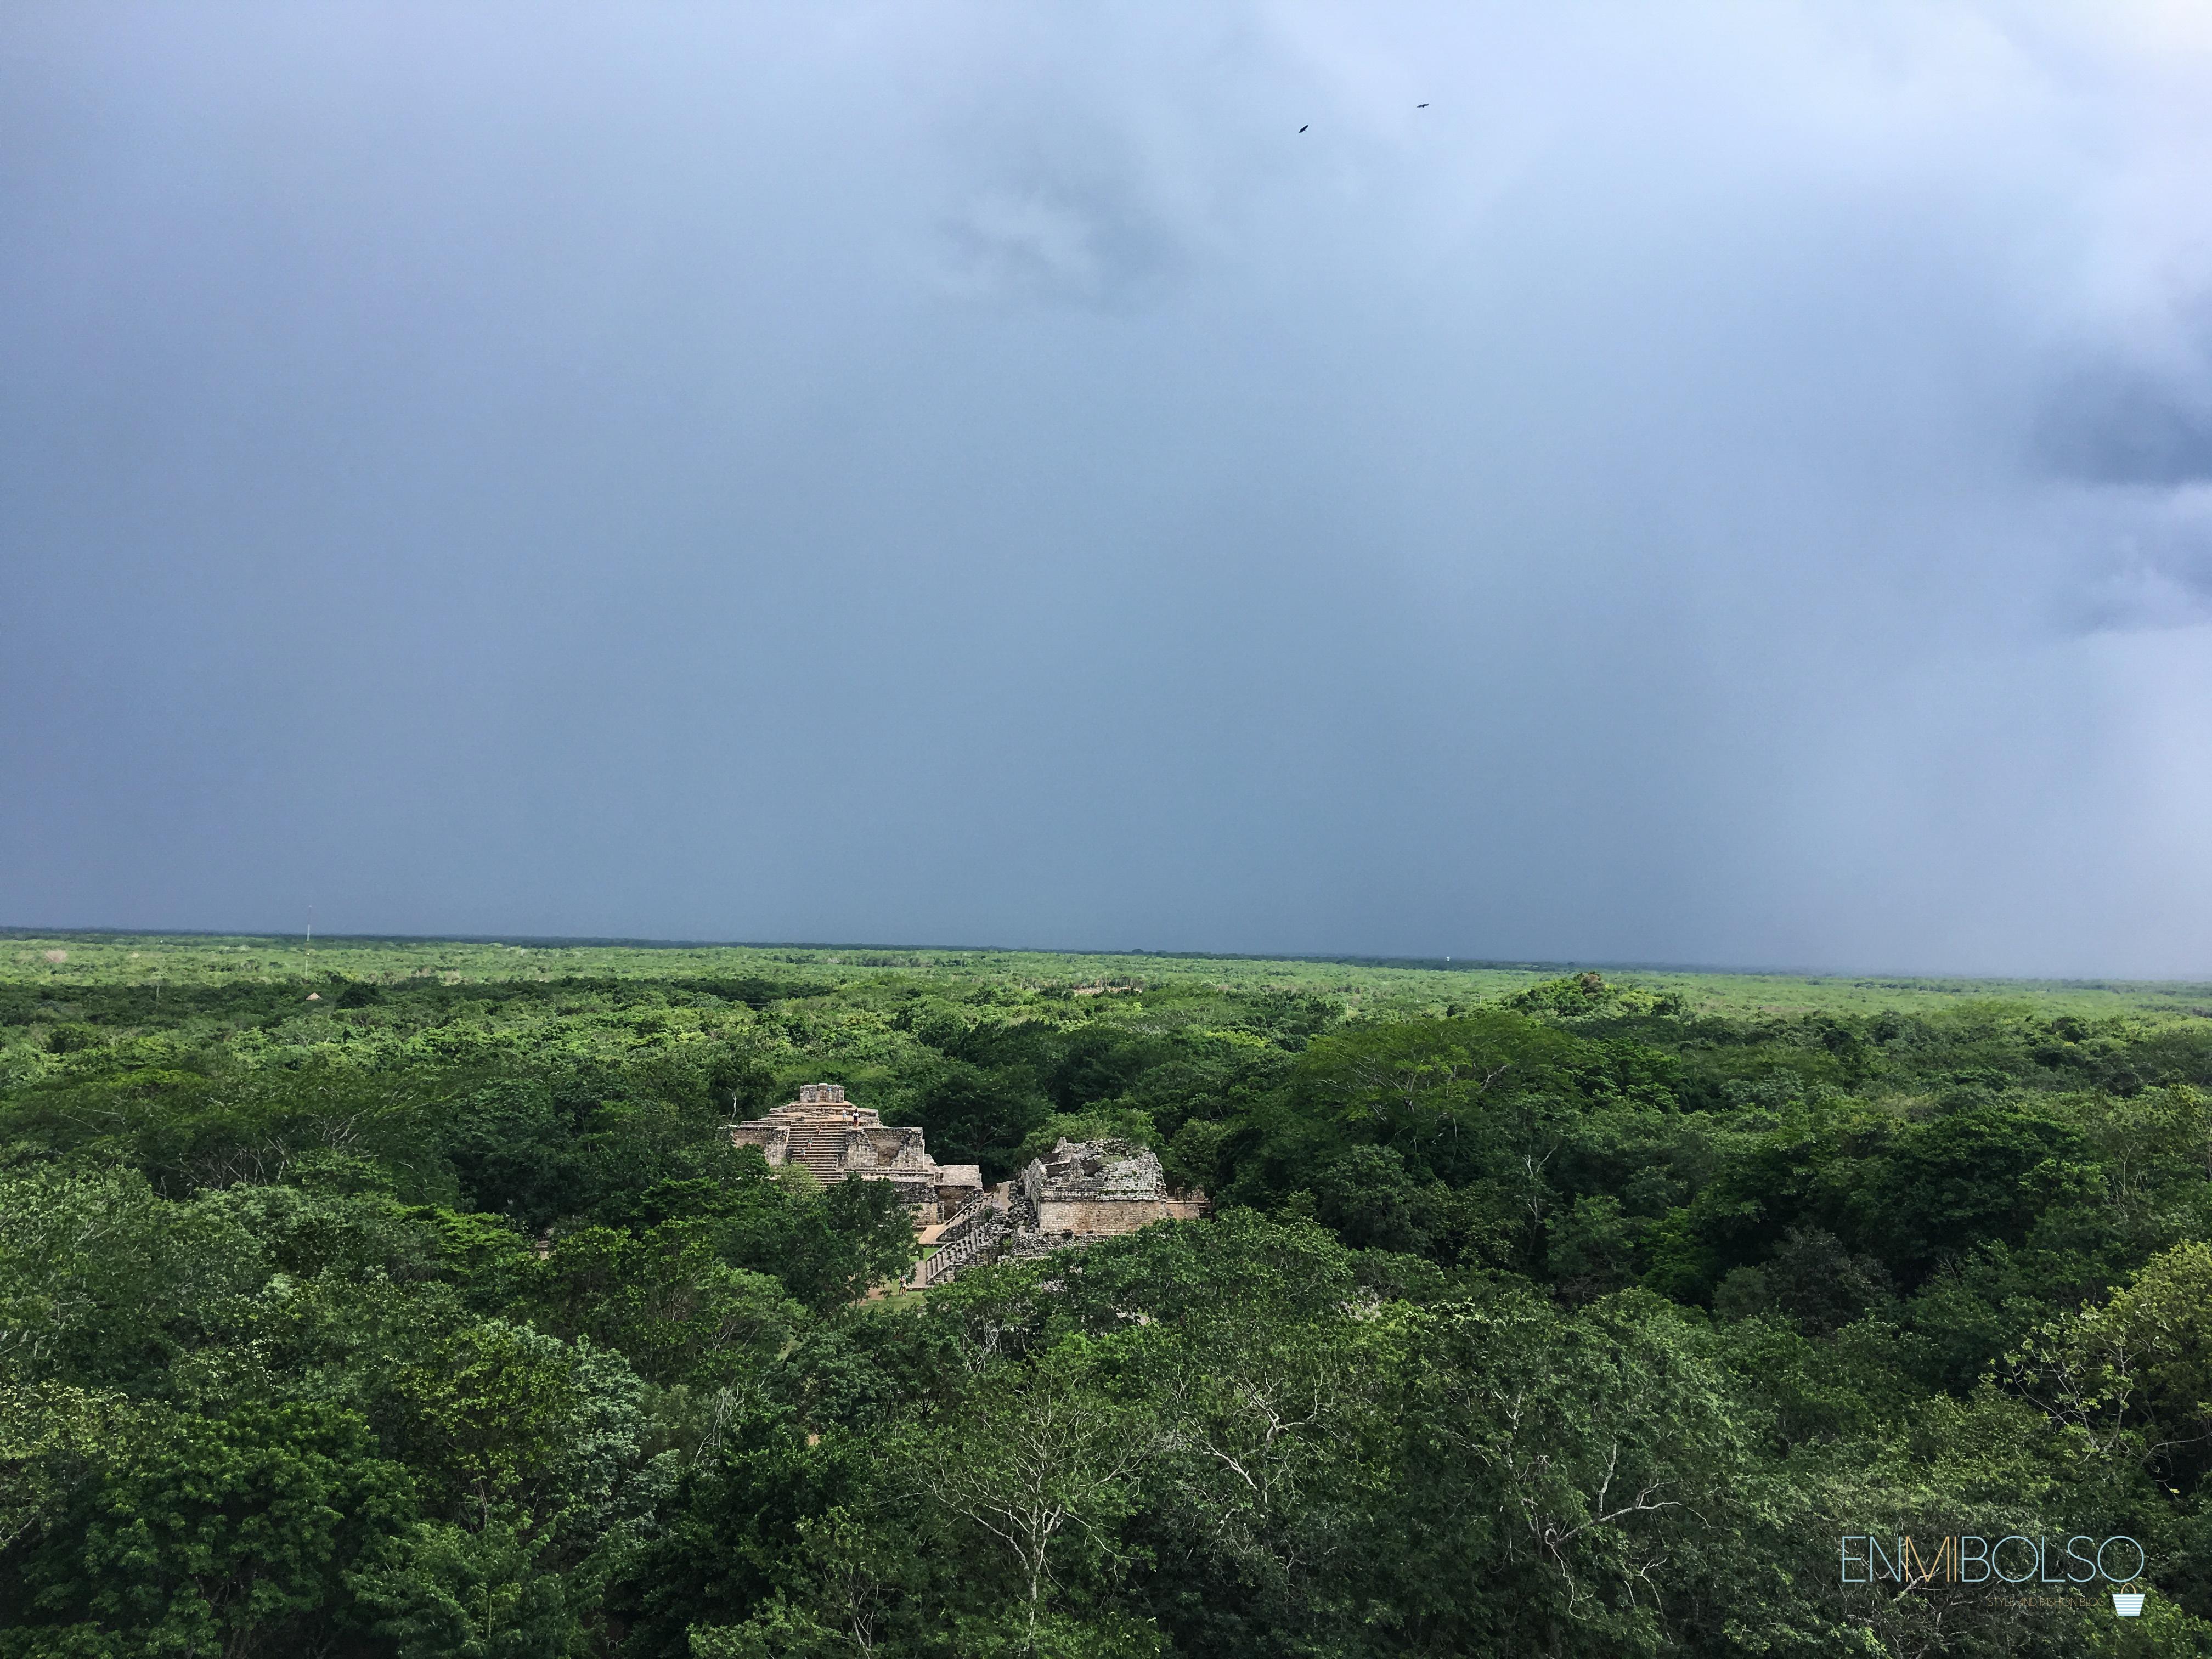 Ek Balam-tormenta-enmibolso